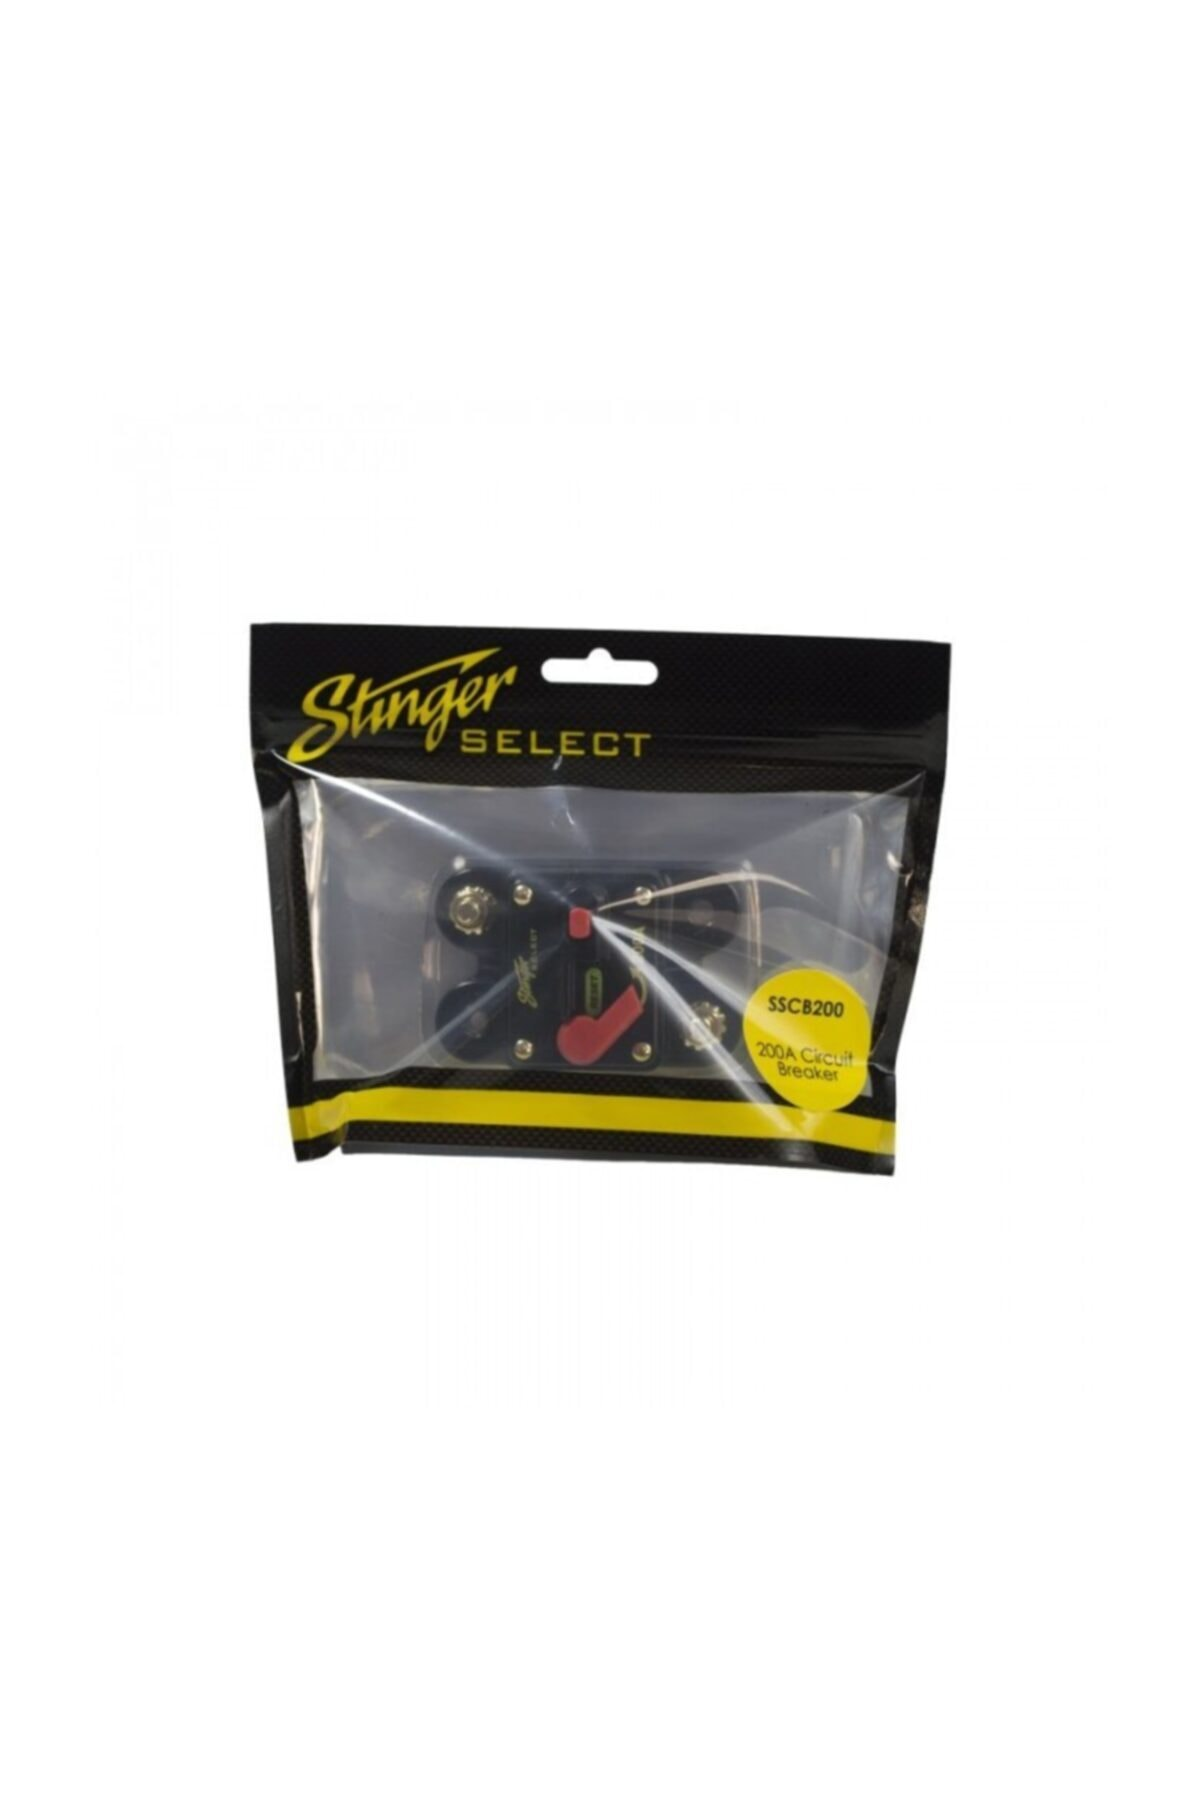 Stinger Sscb200 200a Şalterli Sigortalık